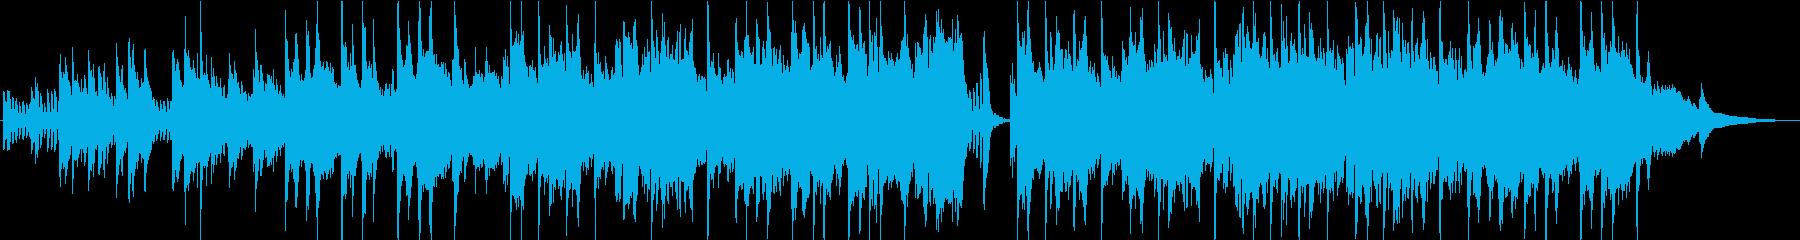 PV】エレガントと感動を併せ持つピアノの再生済みの波形